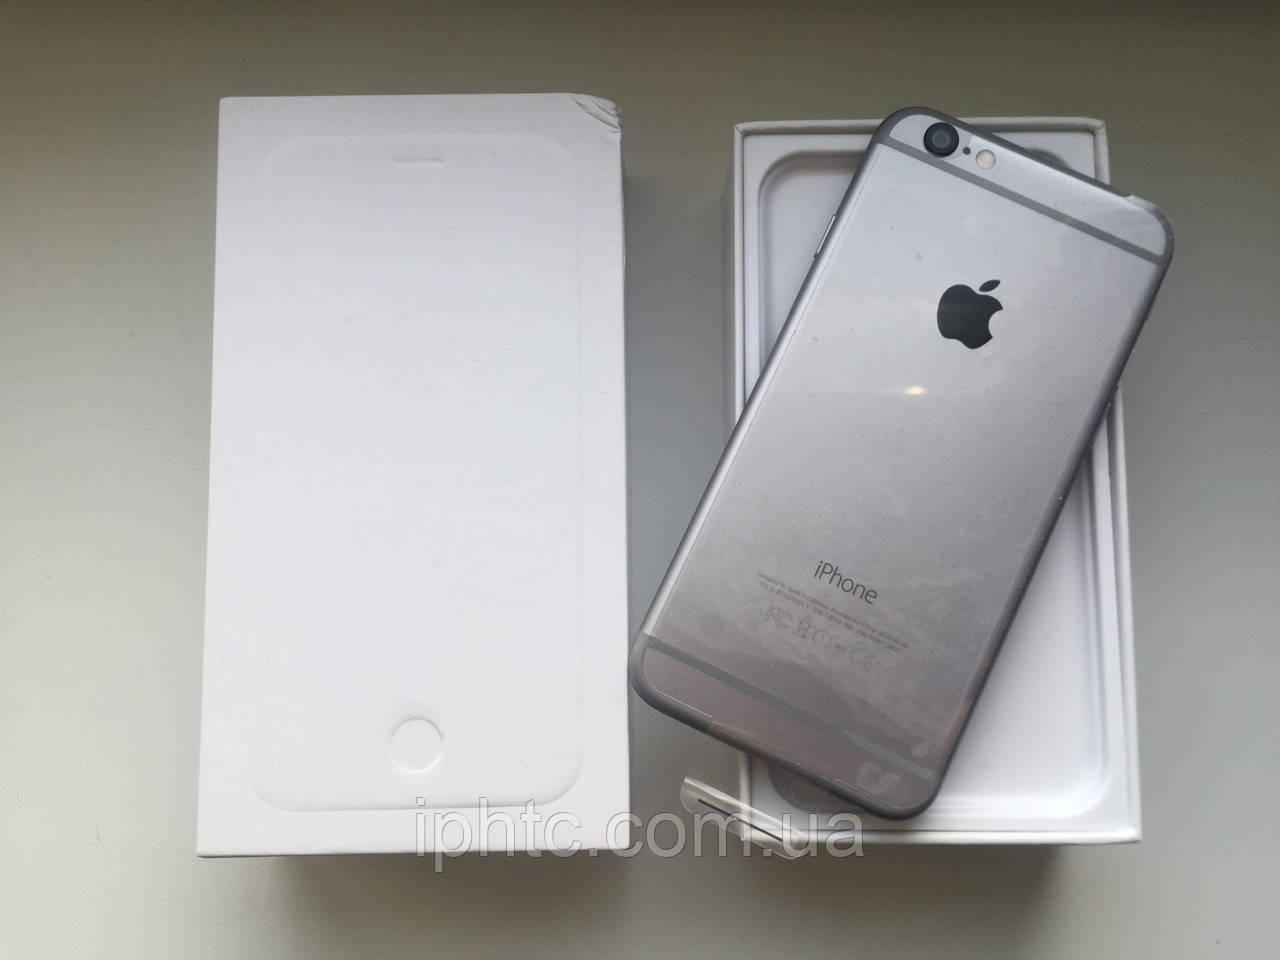 Apple iPhone 6 16GB Space Grey /Новый / NeverLock Запечатан, фото 1